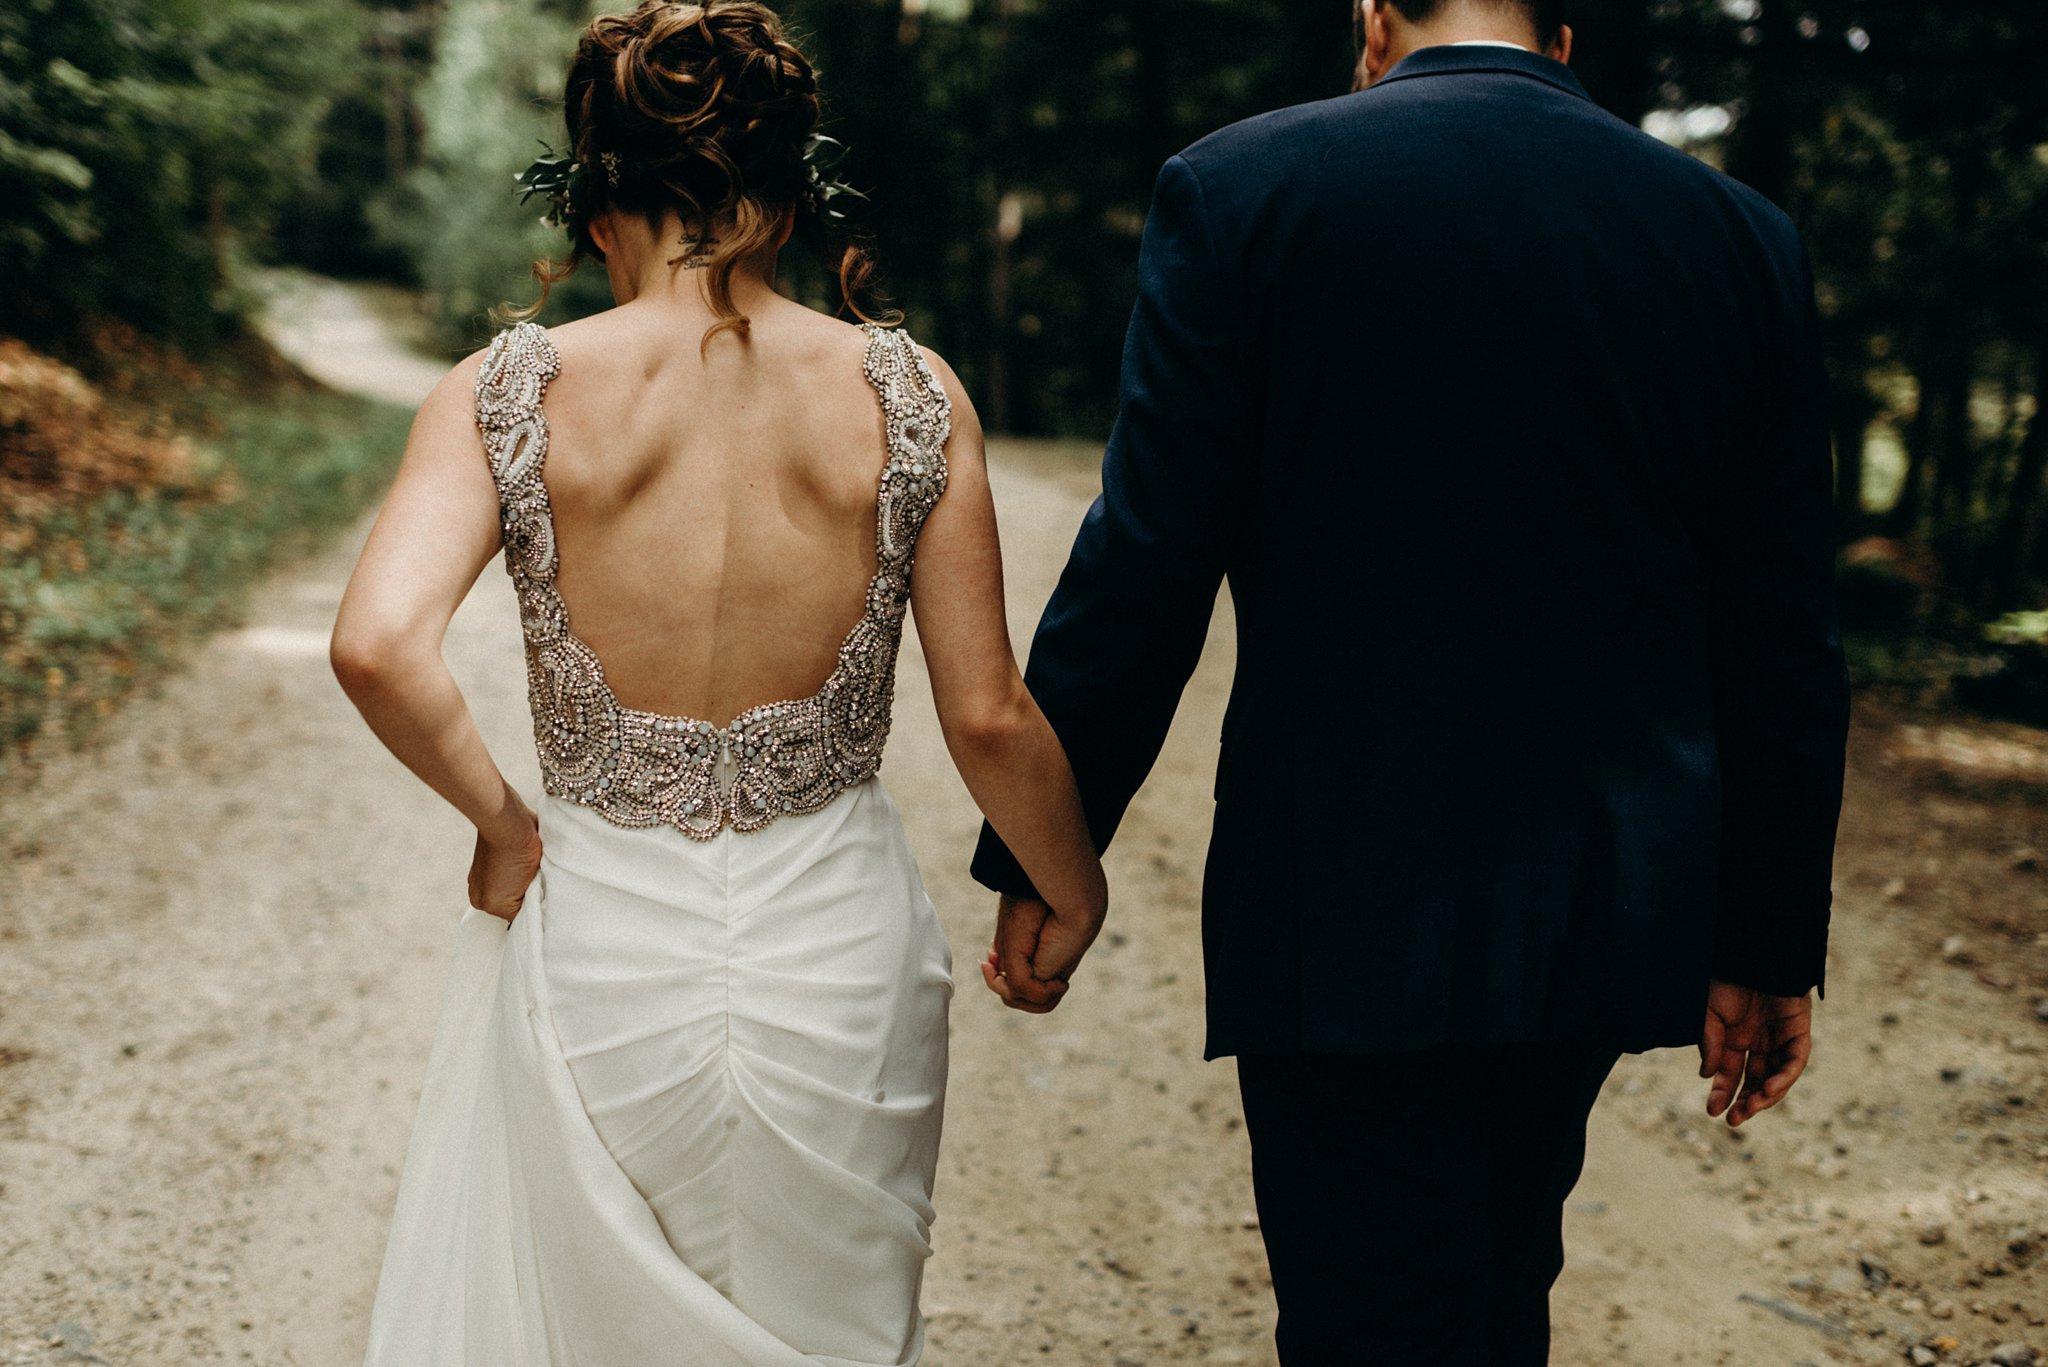 kaihla_tonai_intimate_wedding_elopement_photographer_6585.jpg